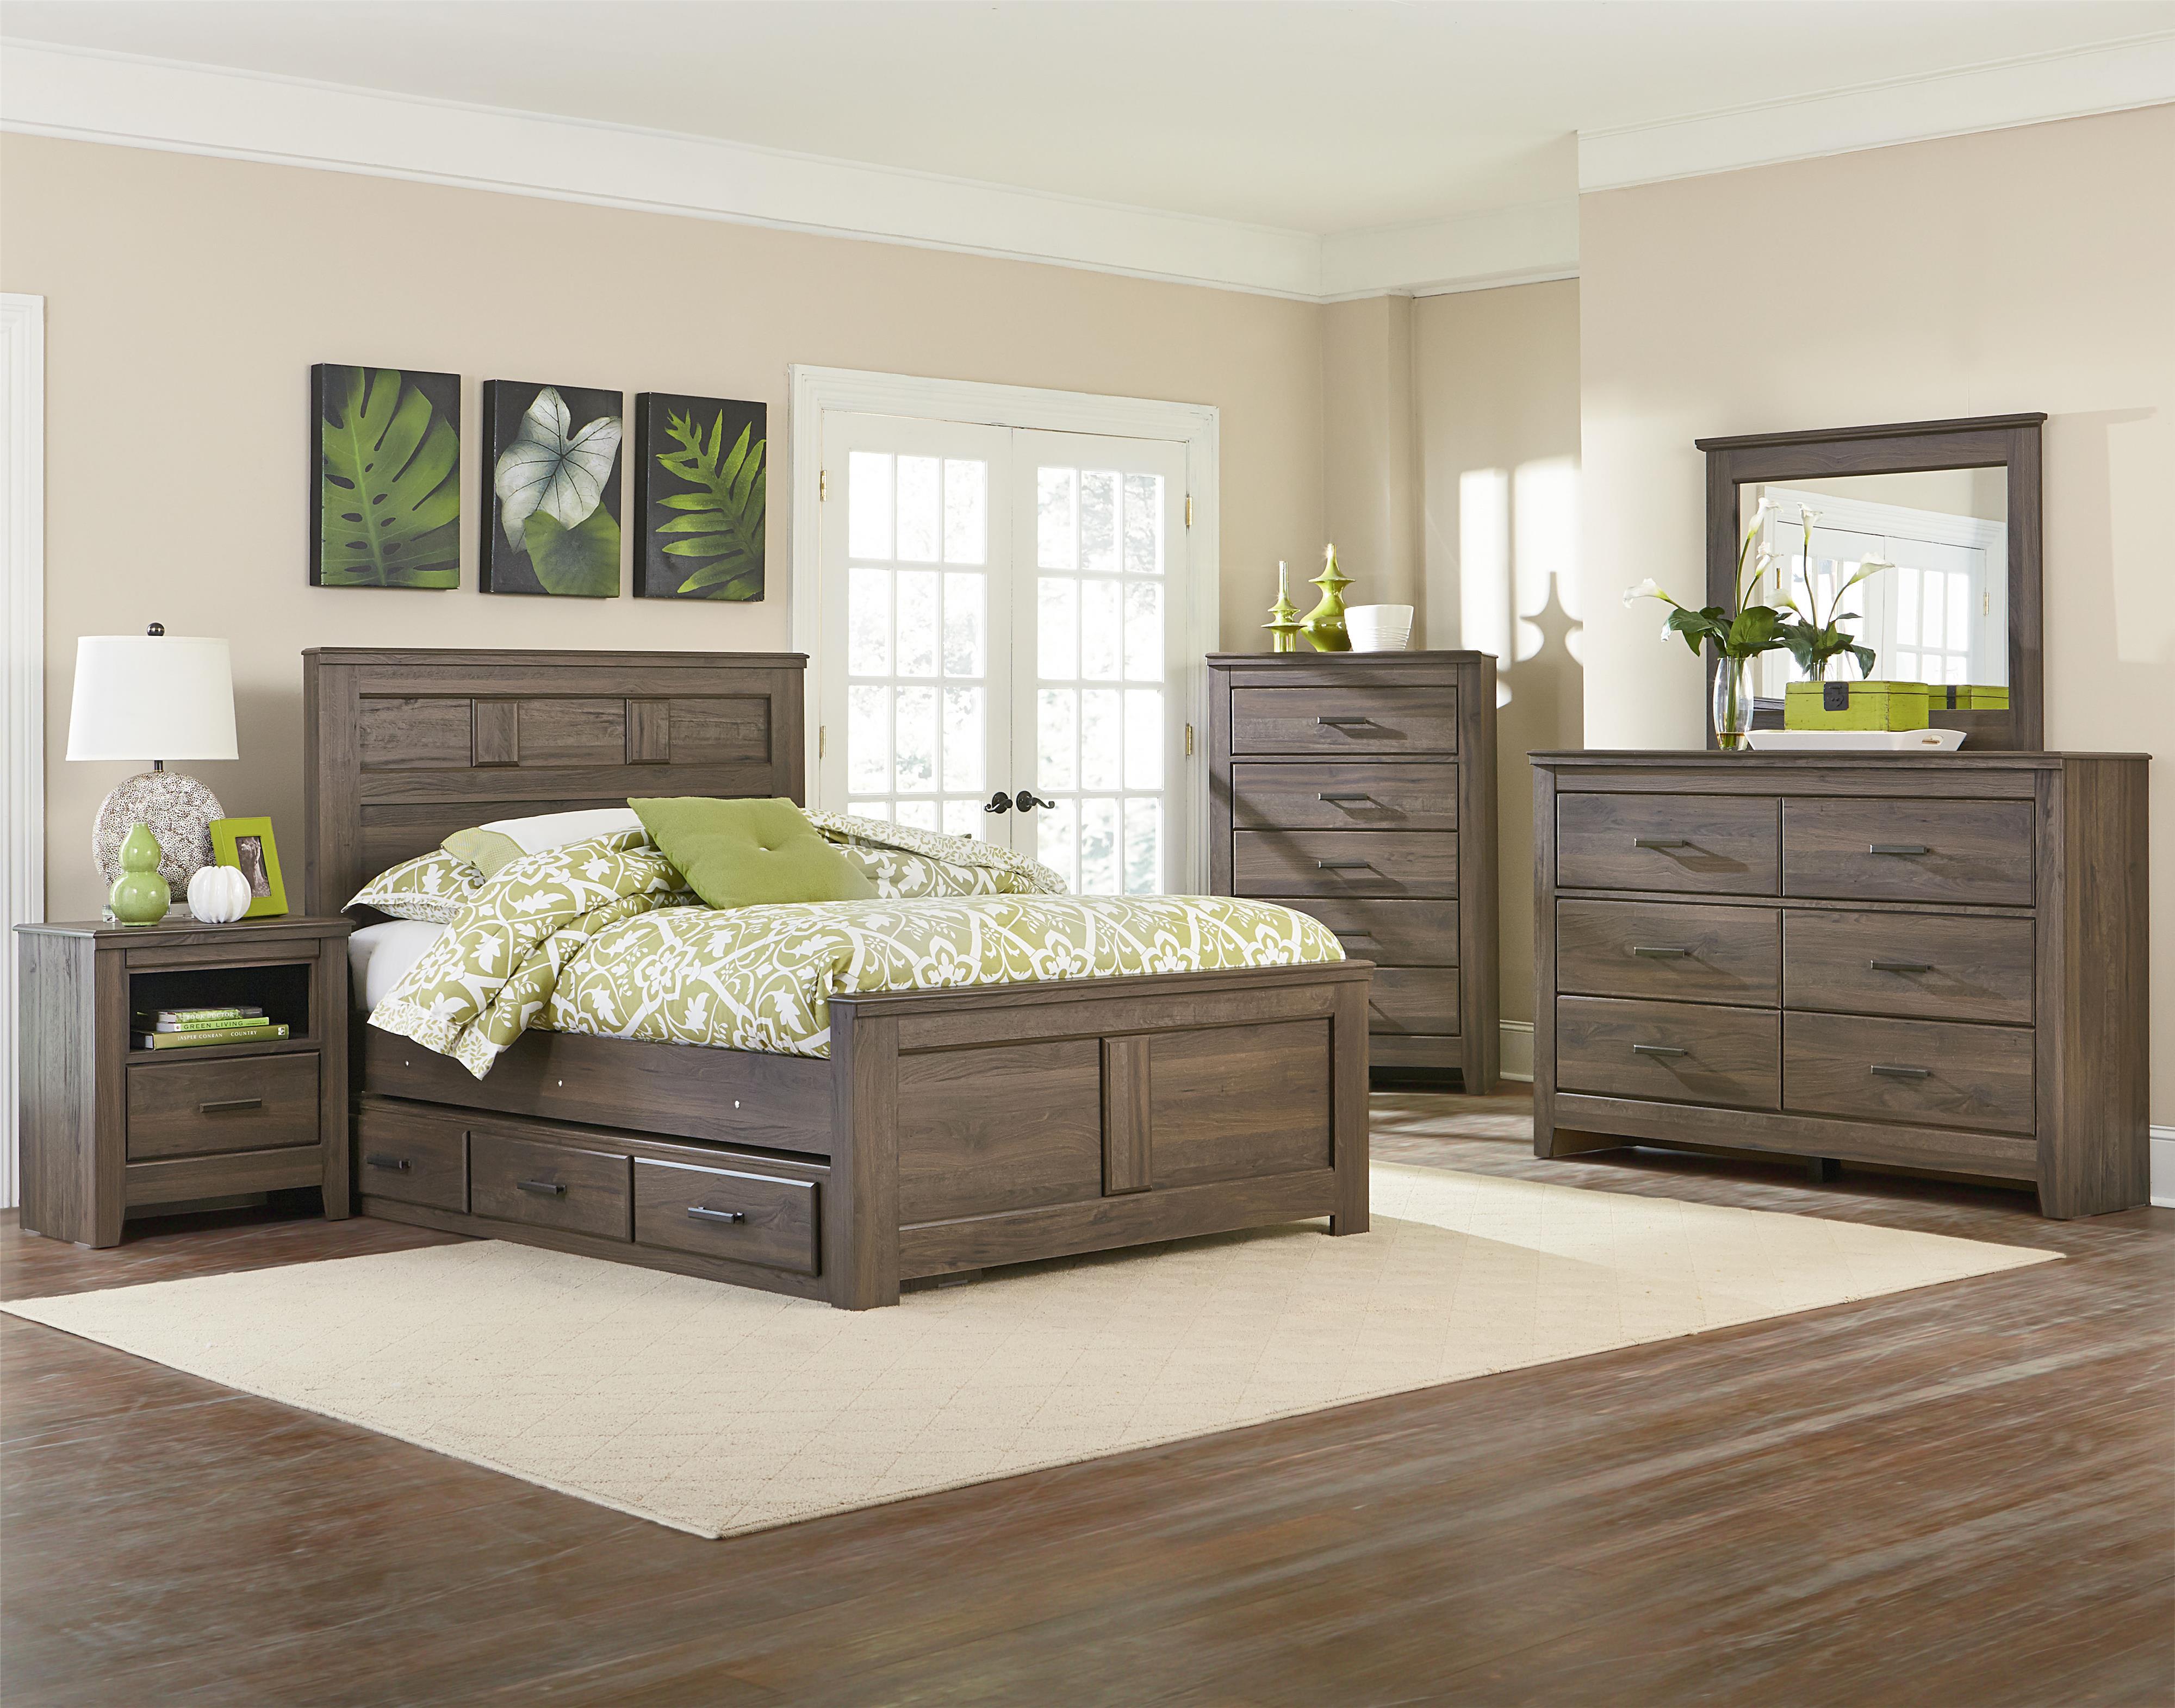 Queen bedroom group low price guarantee badge by standard furniture